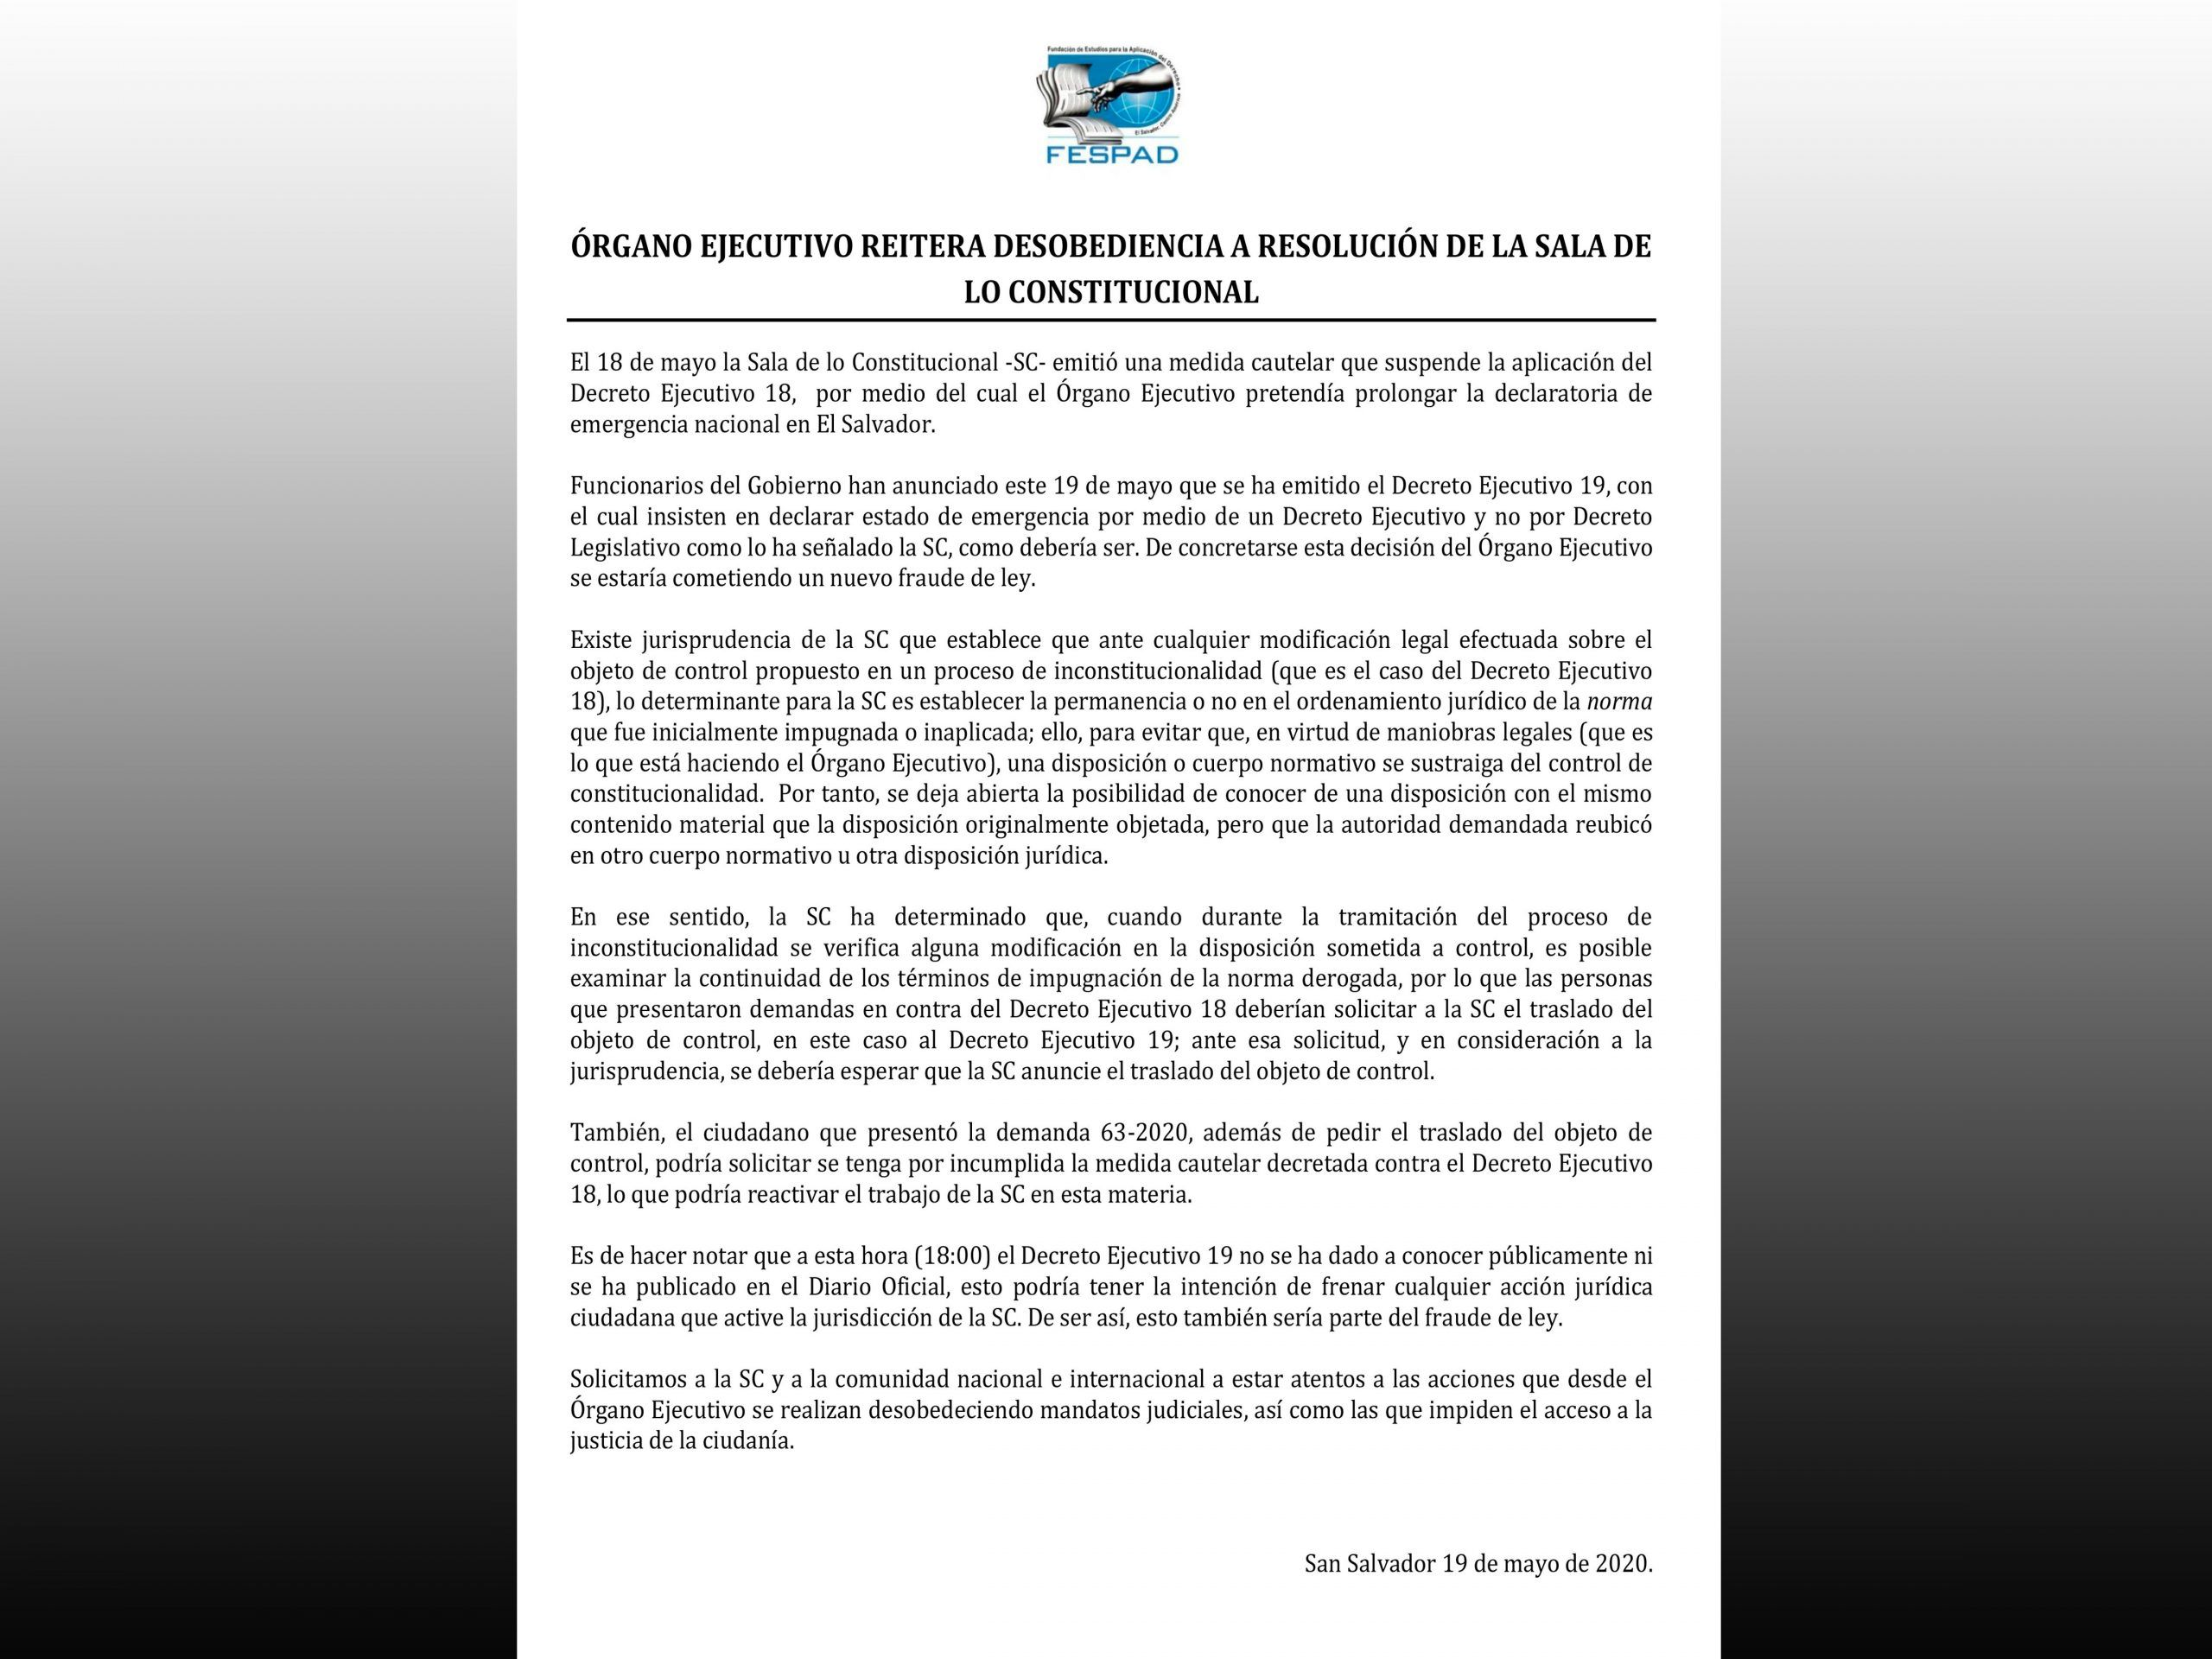 Comunicado: Órgano Ejecutivo reitera desobediencia a resolución de Sala